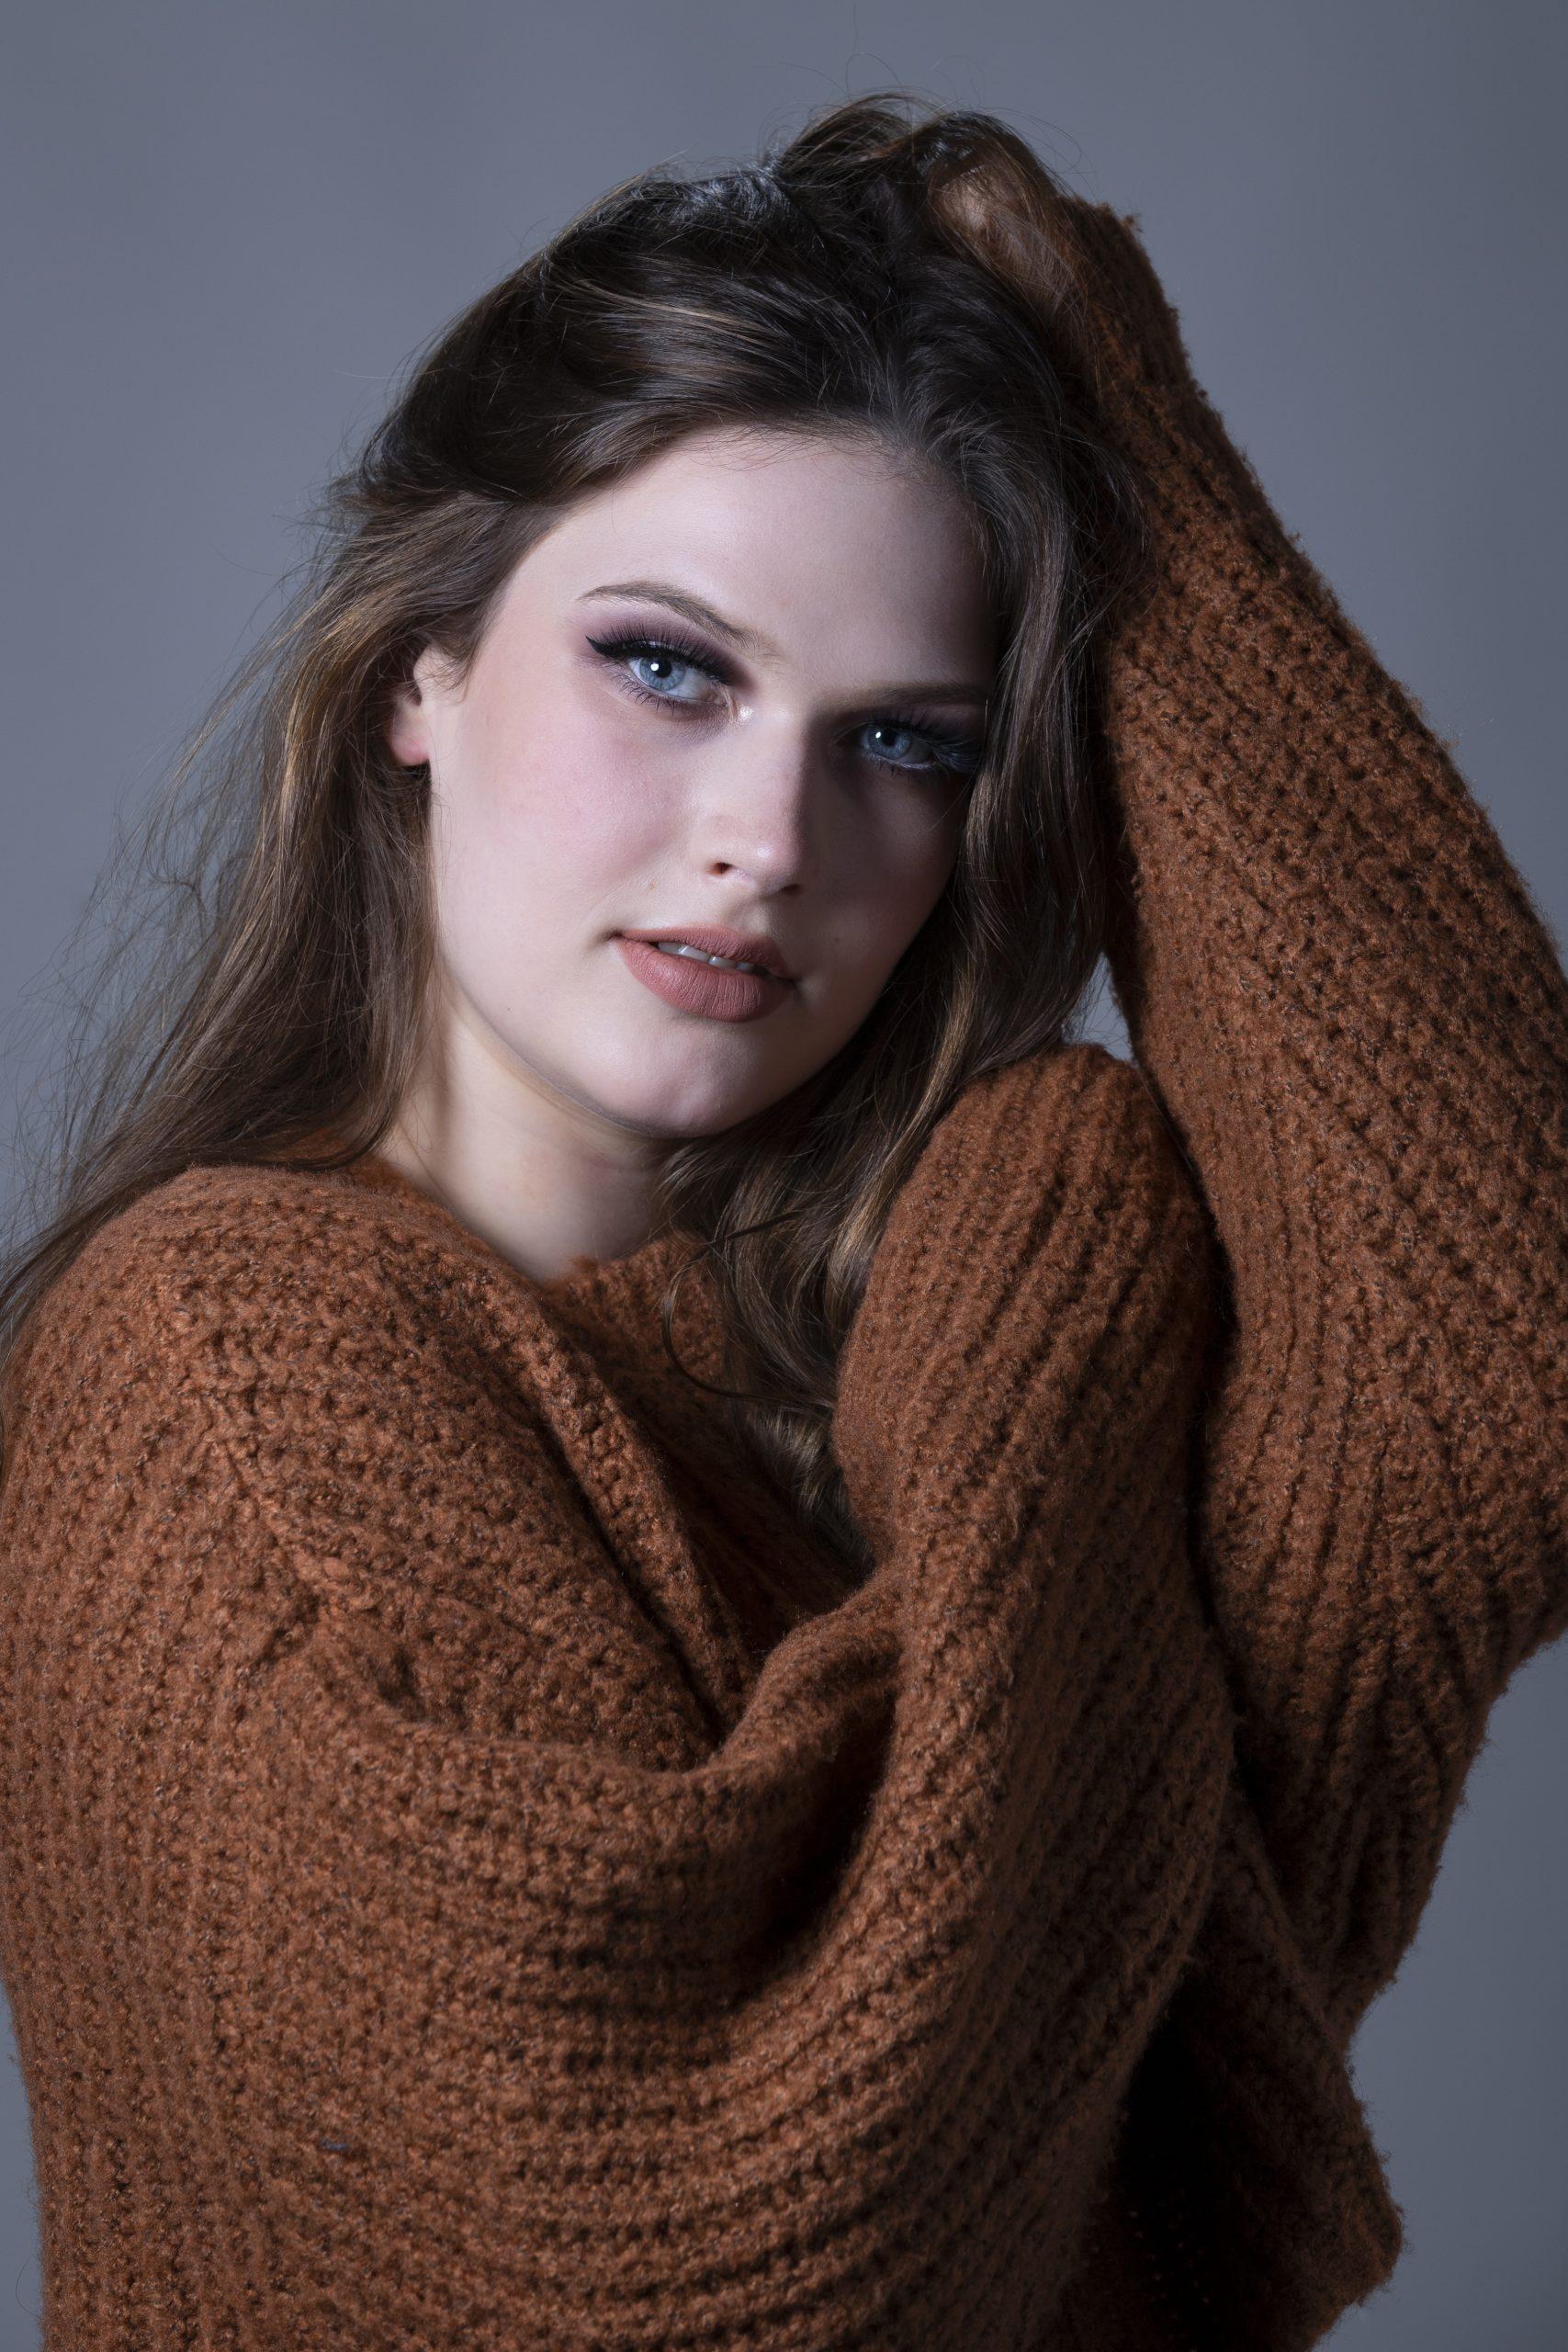 Emma shooting portrait commercial